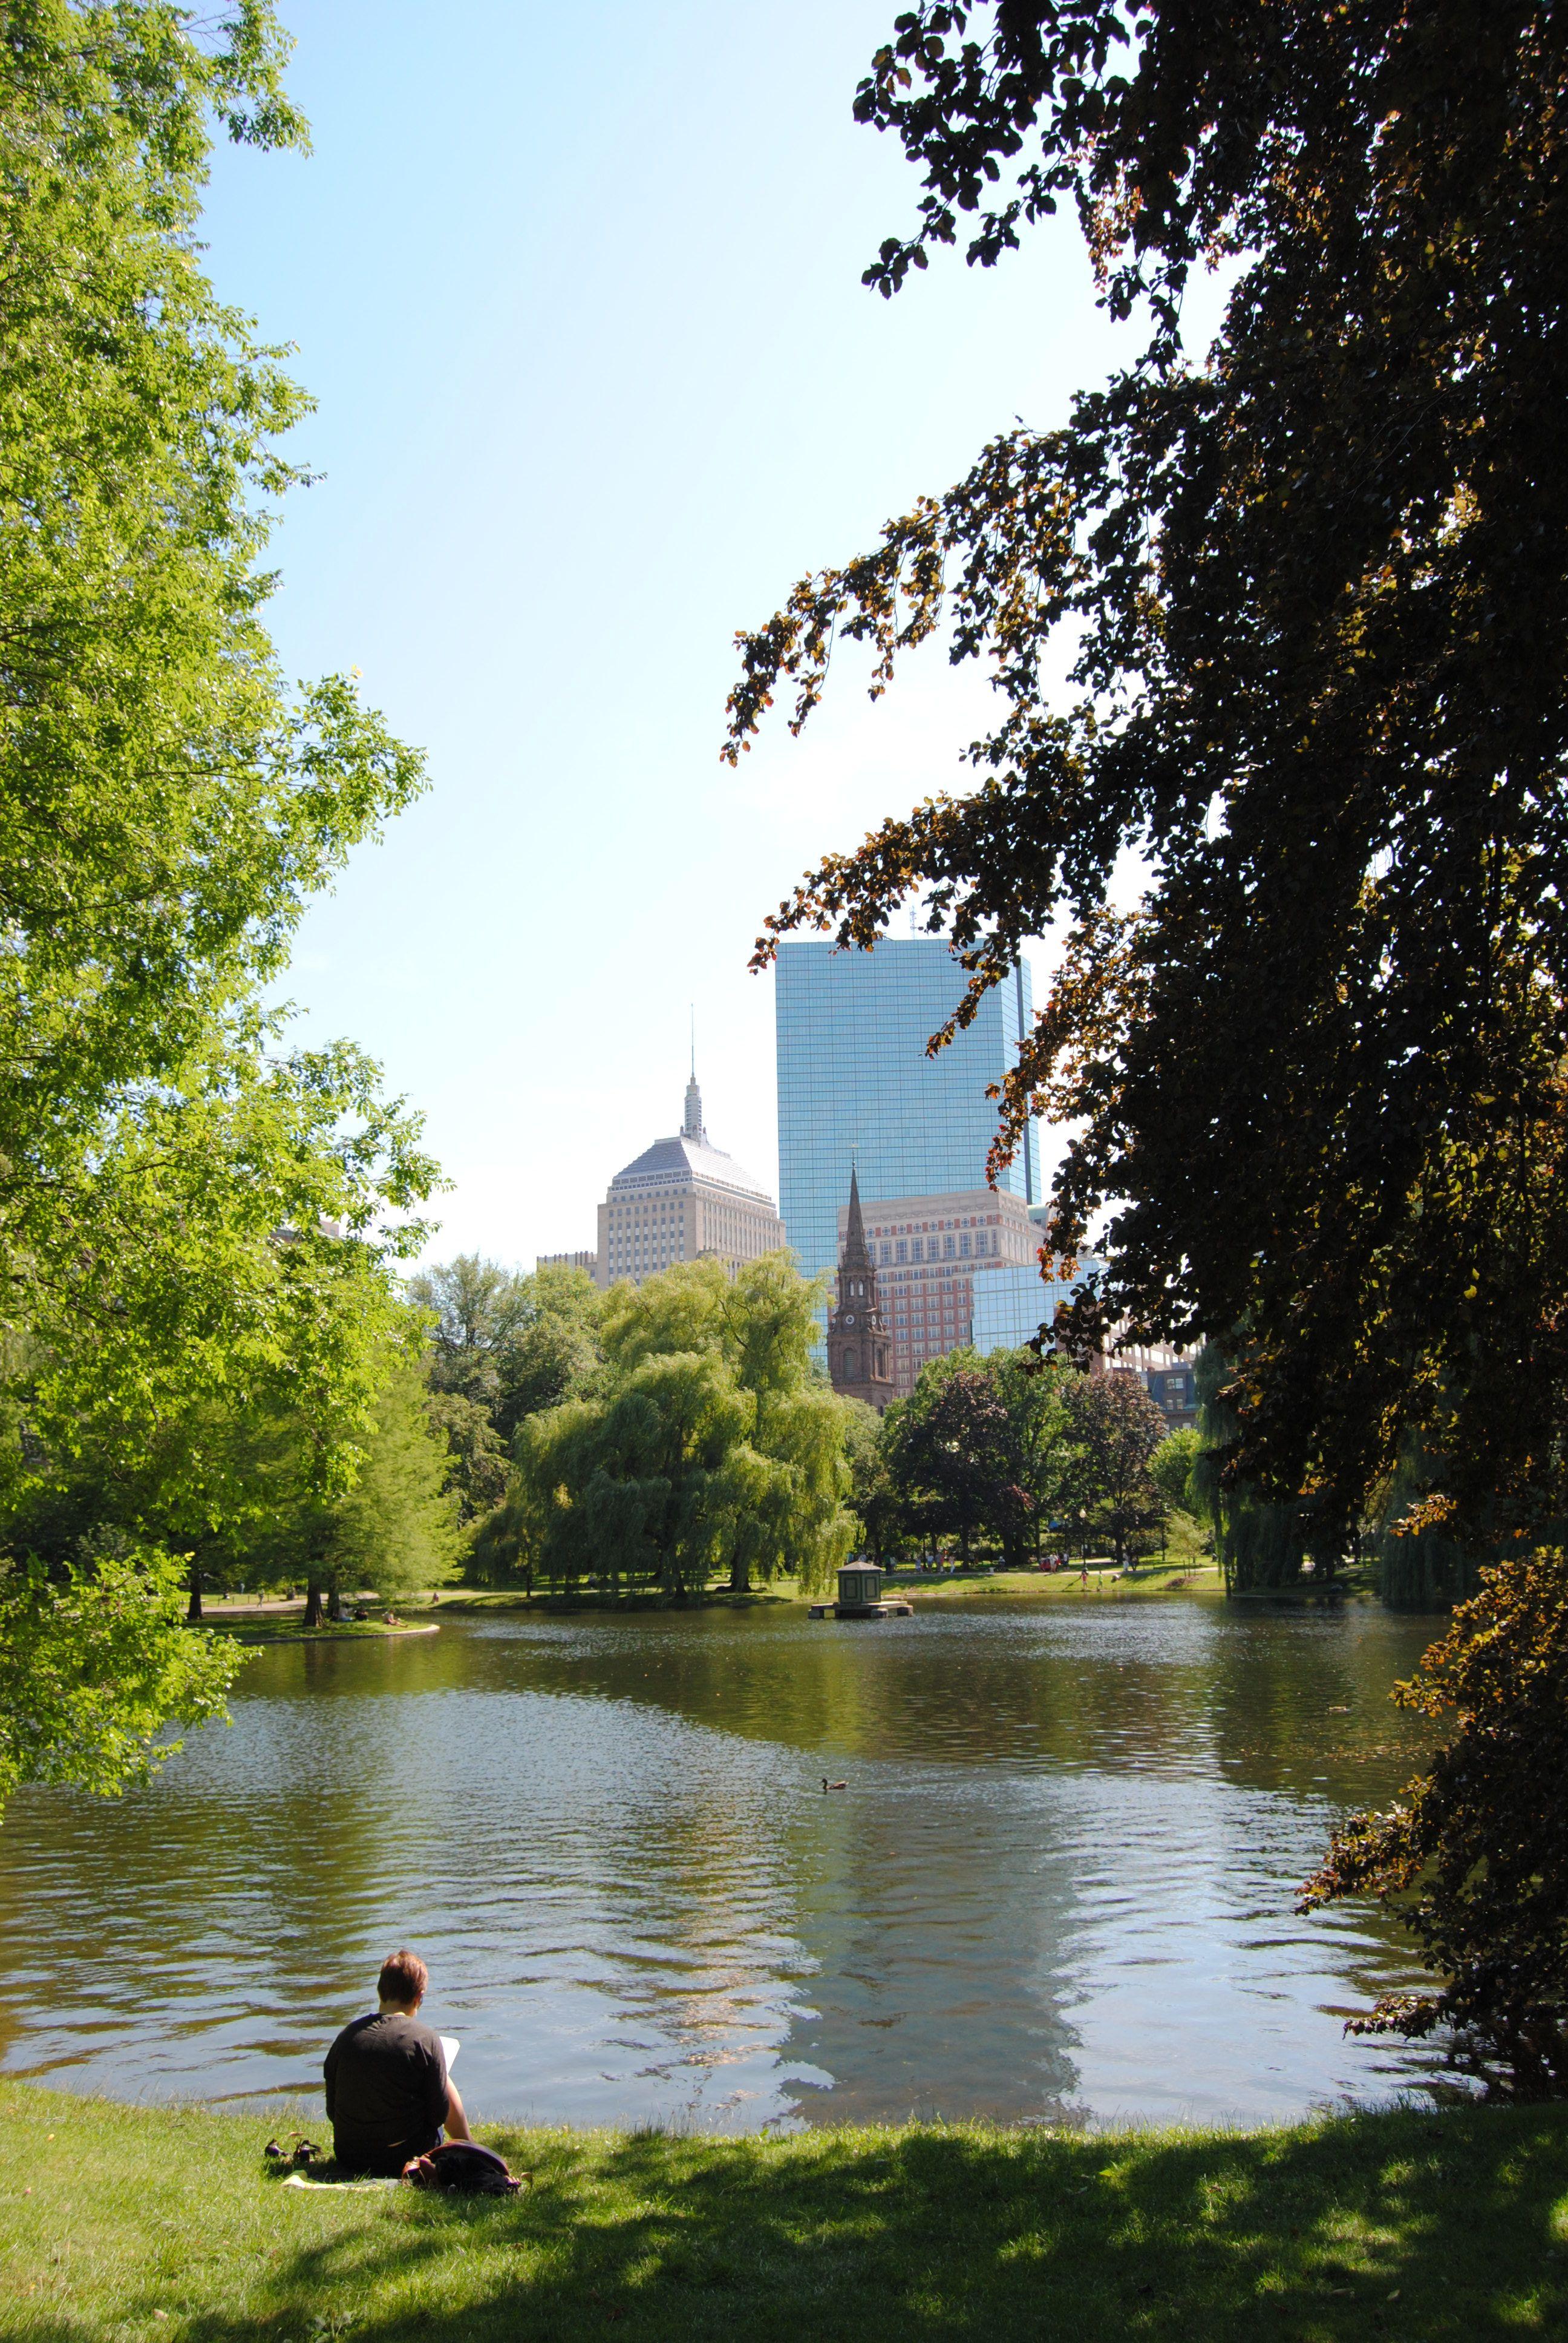 Pin di Kristen Forni su journeys Massachusetts